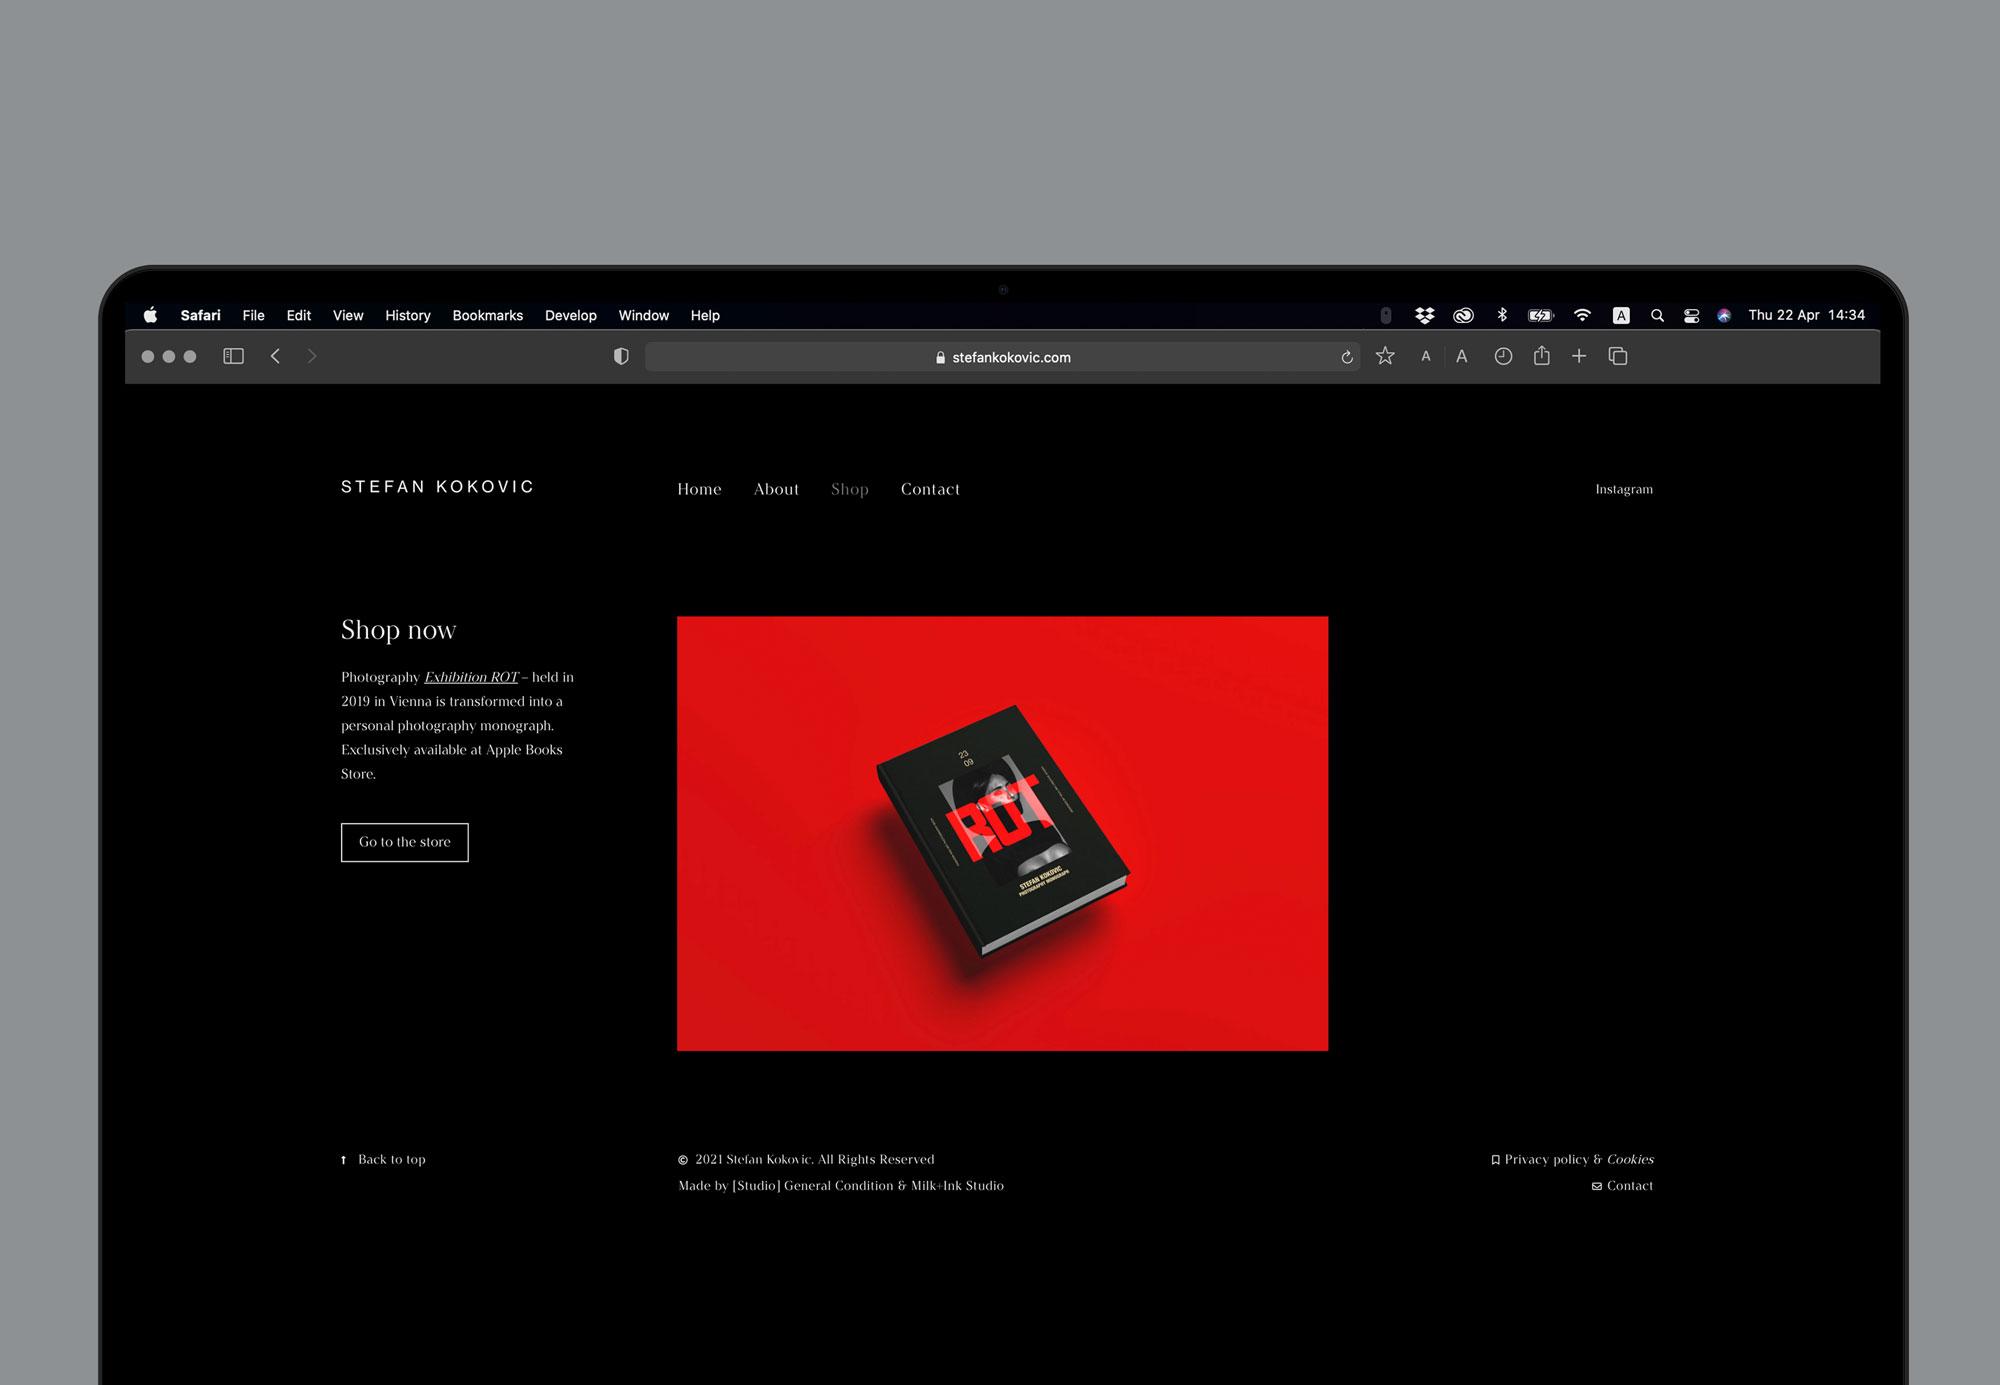 general condition studio belgrade vienna jovan lakic graphic design stefan kokovic